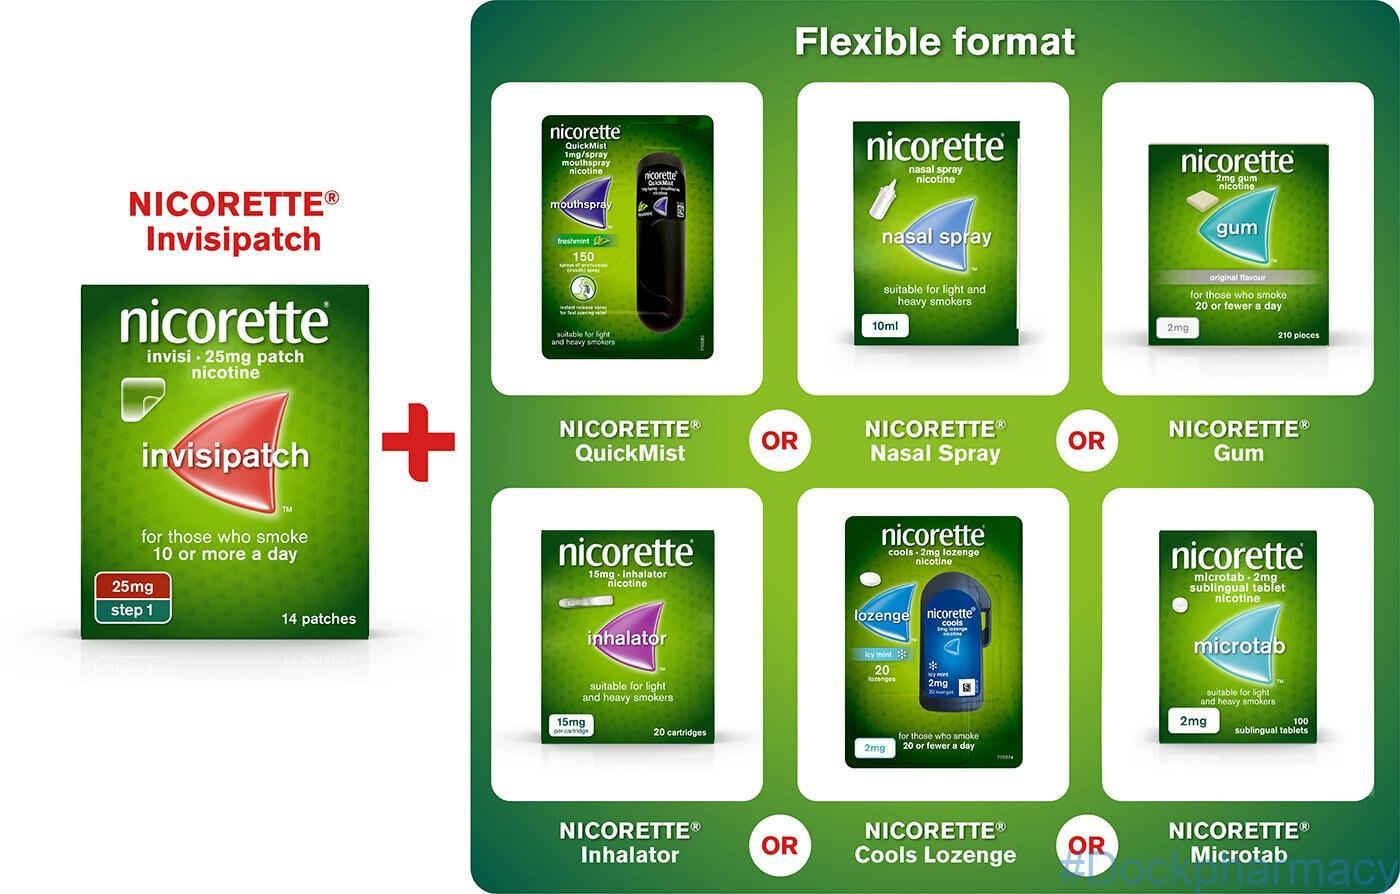 Nicorette product range